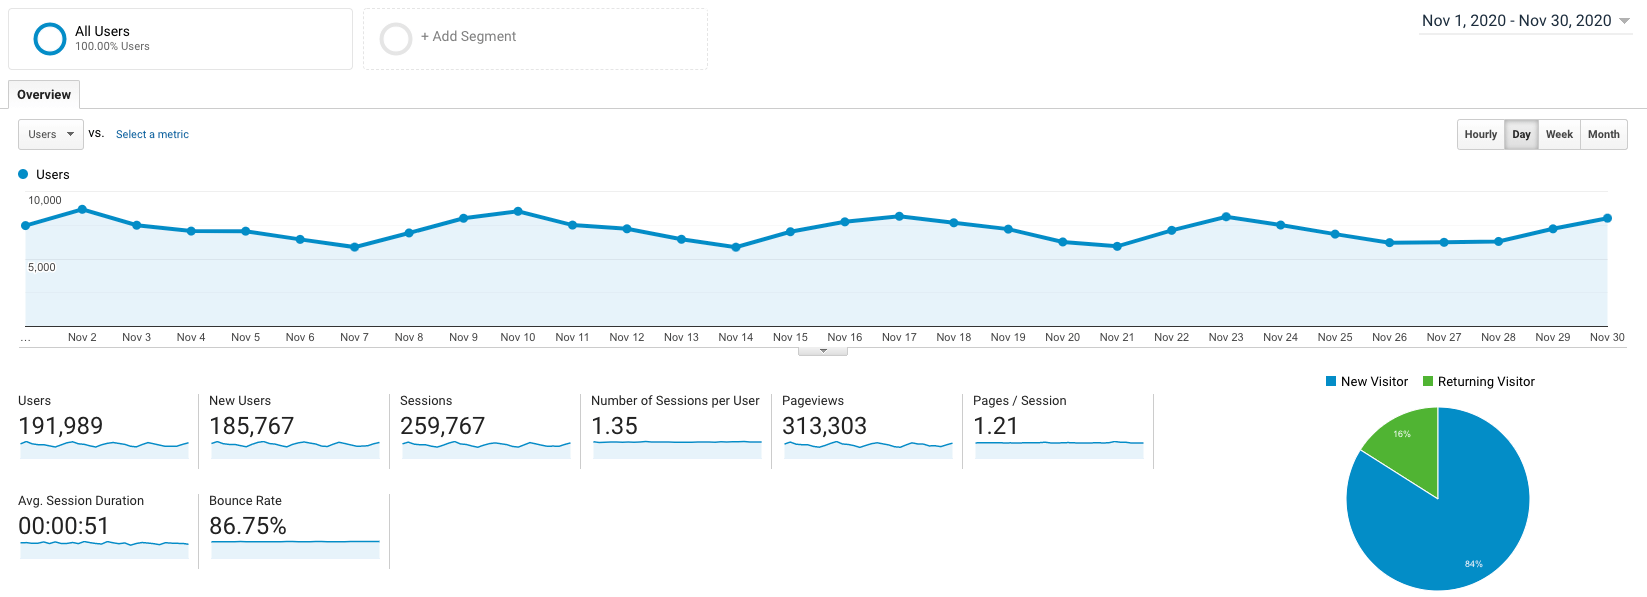 Informe de ingresos del blog de noviembre de 2020 Captura de pantalla de Google Analytics (ryrob)